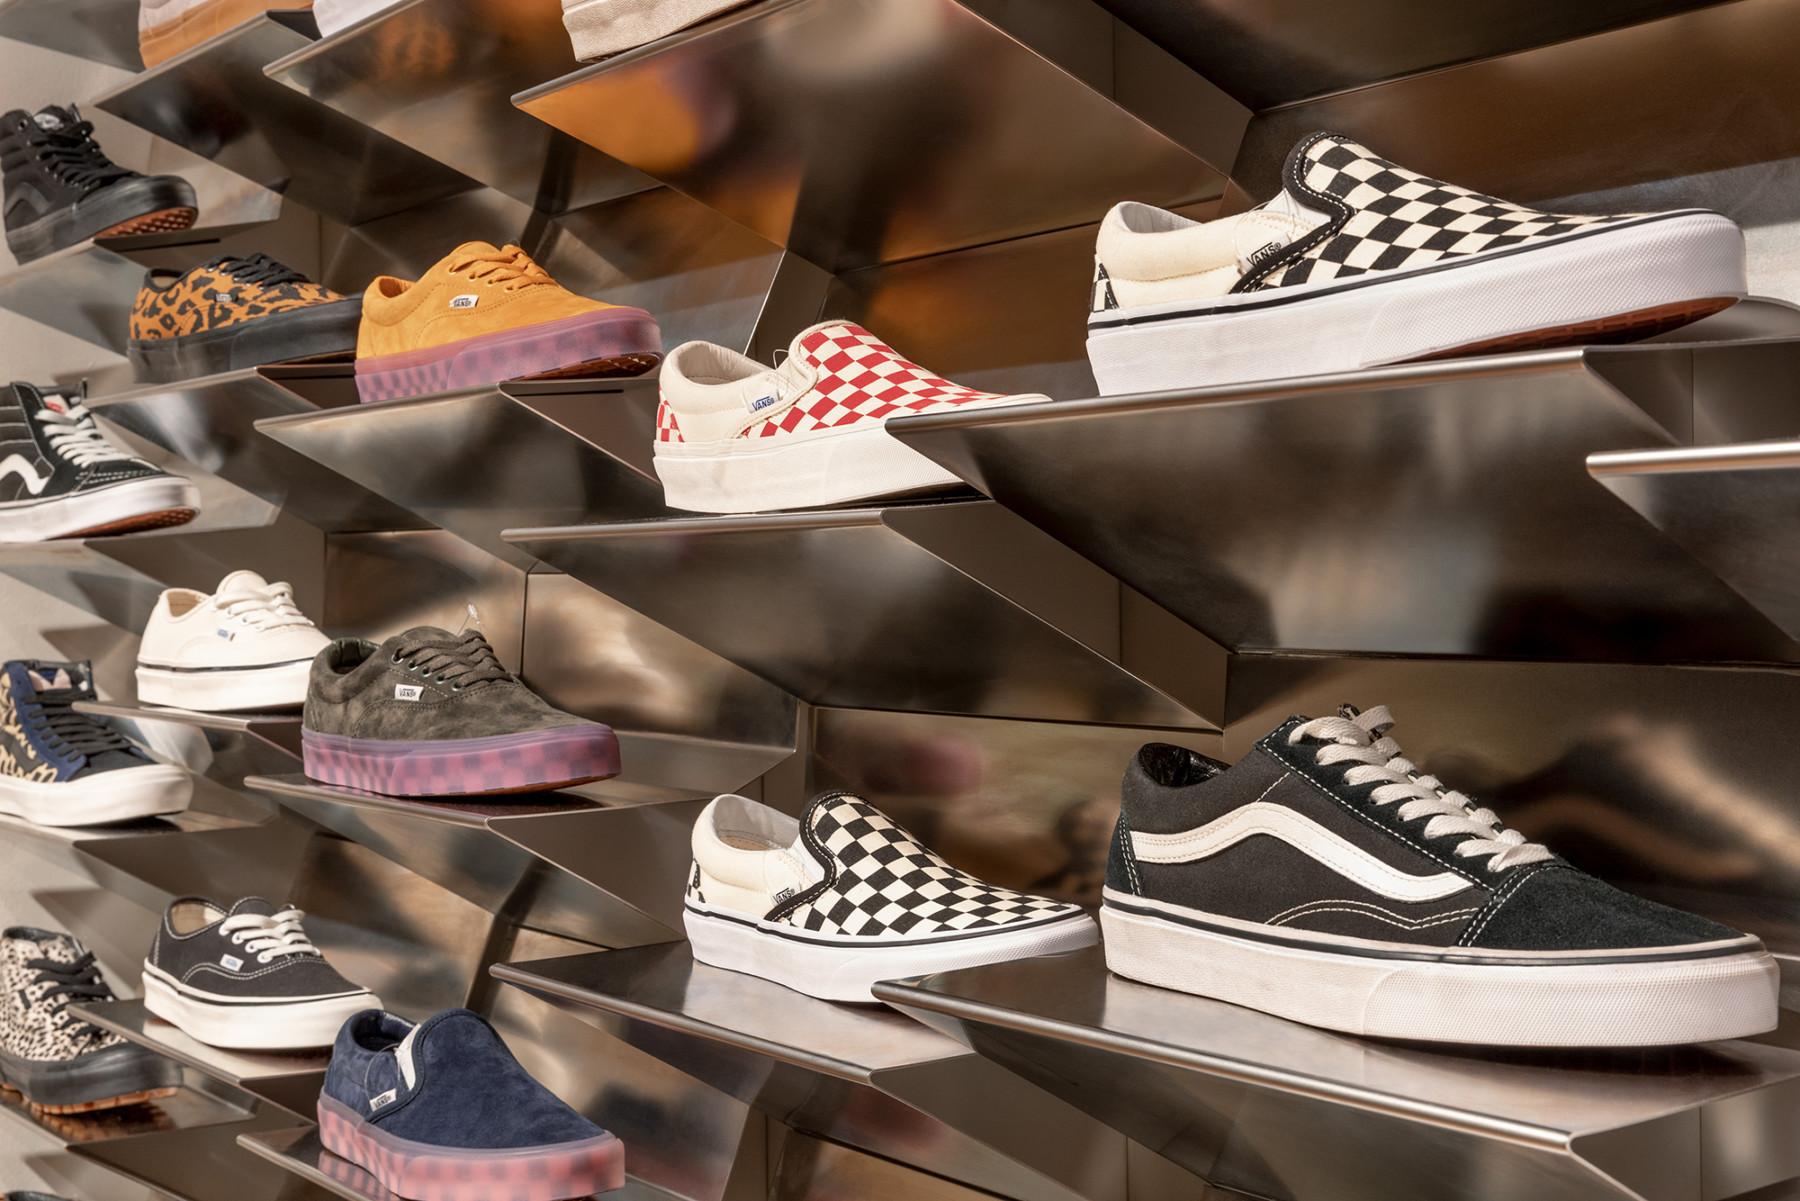 jamie-fobert-architects-selfridges-shoe-galleries-luxury-retail-concept-gallery-design-olivier-hess-photos-sneaker-wall4